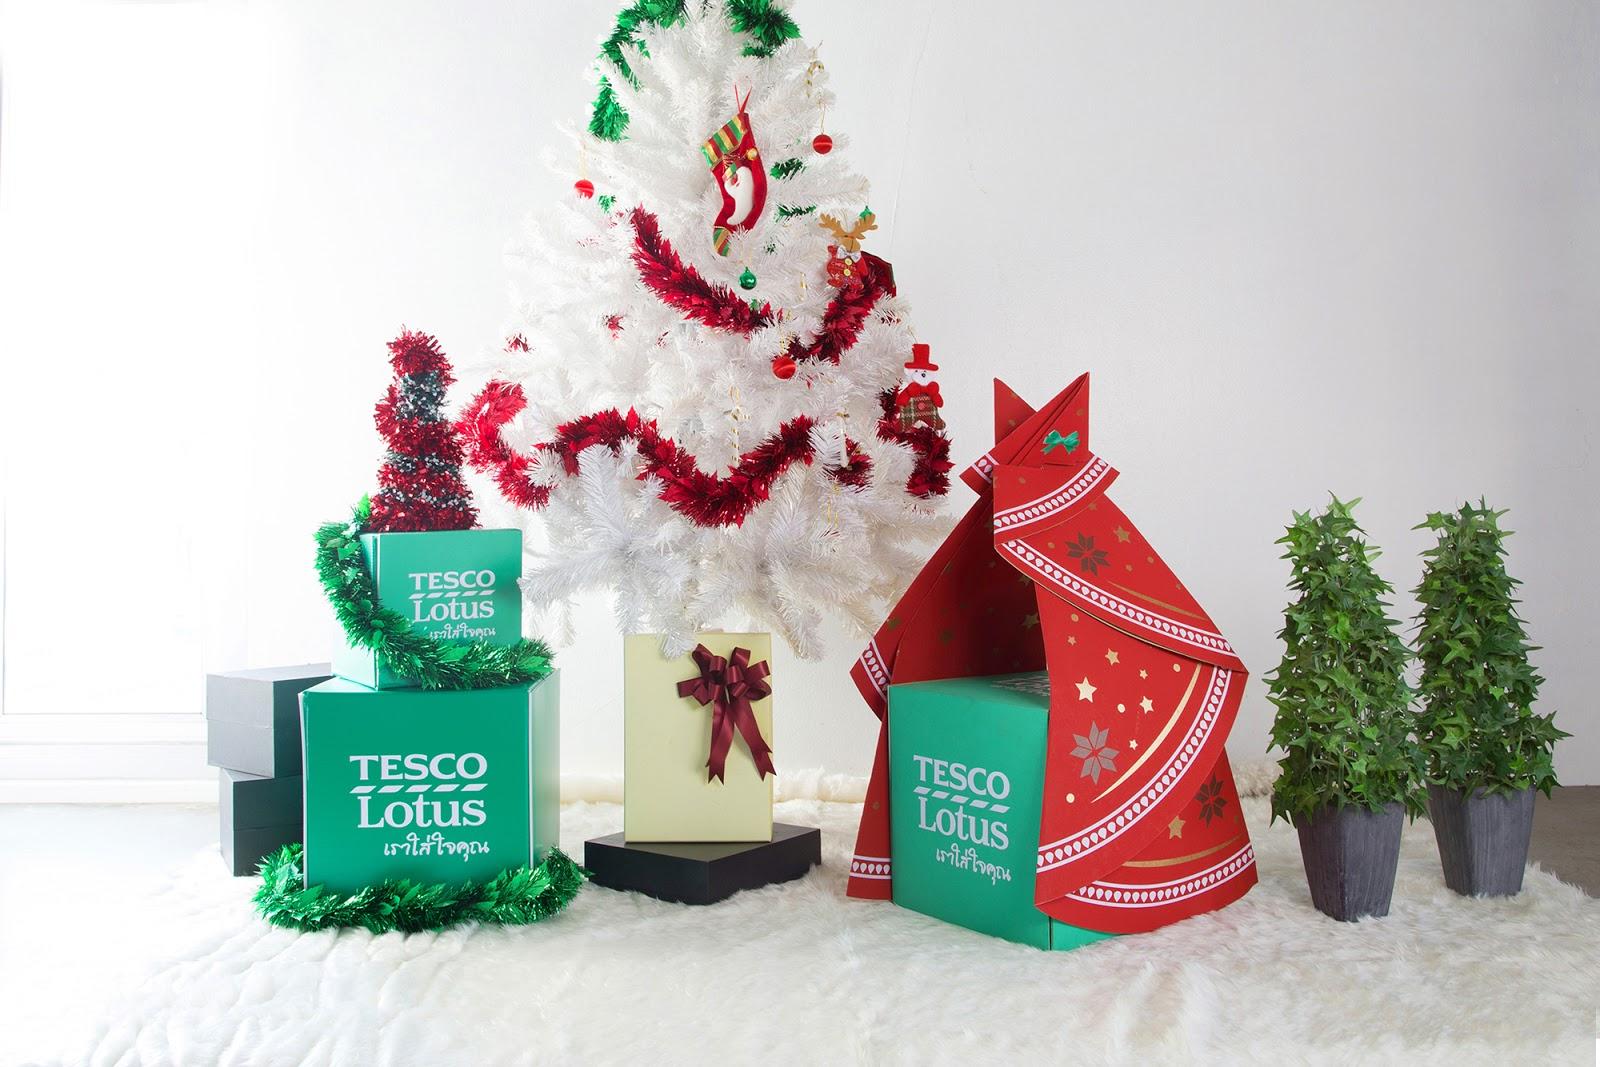 Tesco Lotus Christmas Tree Gift Set Box on Packaging of ...